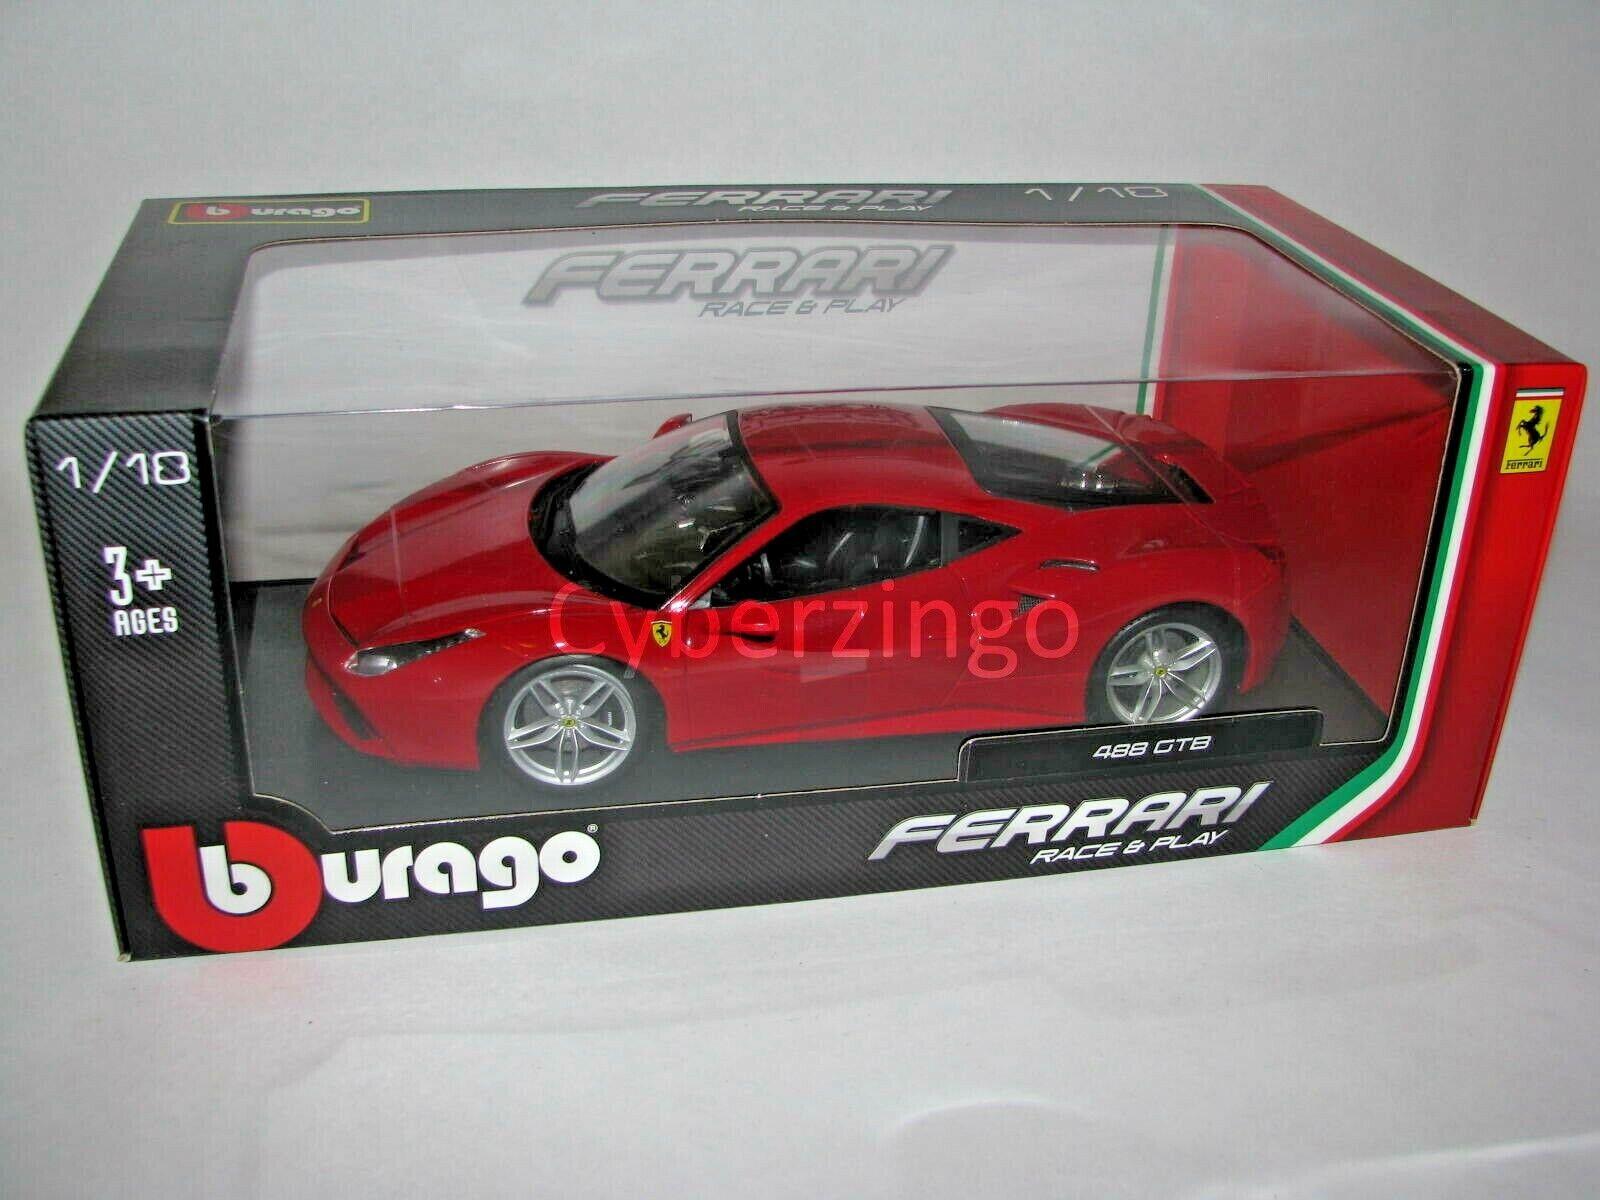 Ferrari 488 Gtb Race And Play Bburago 1 18 Red Diecast Model Car Preowned Ebay